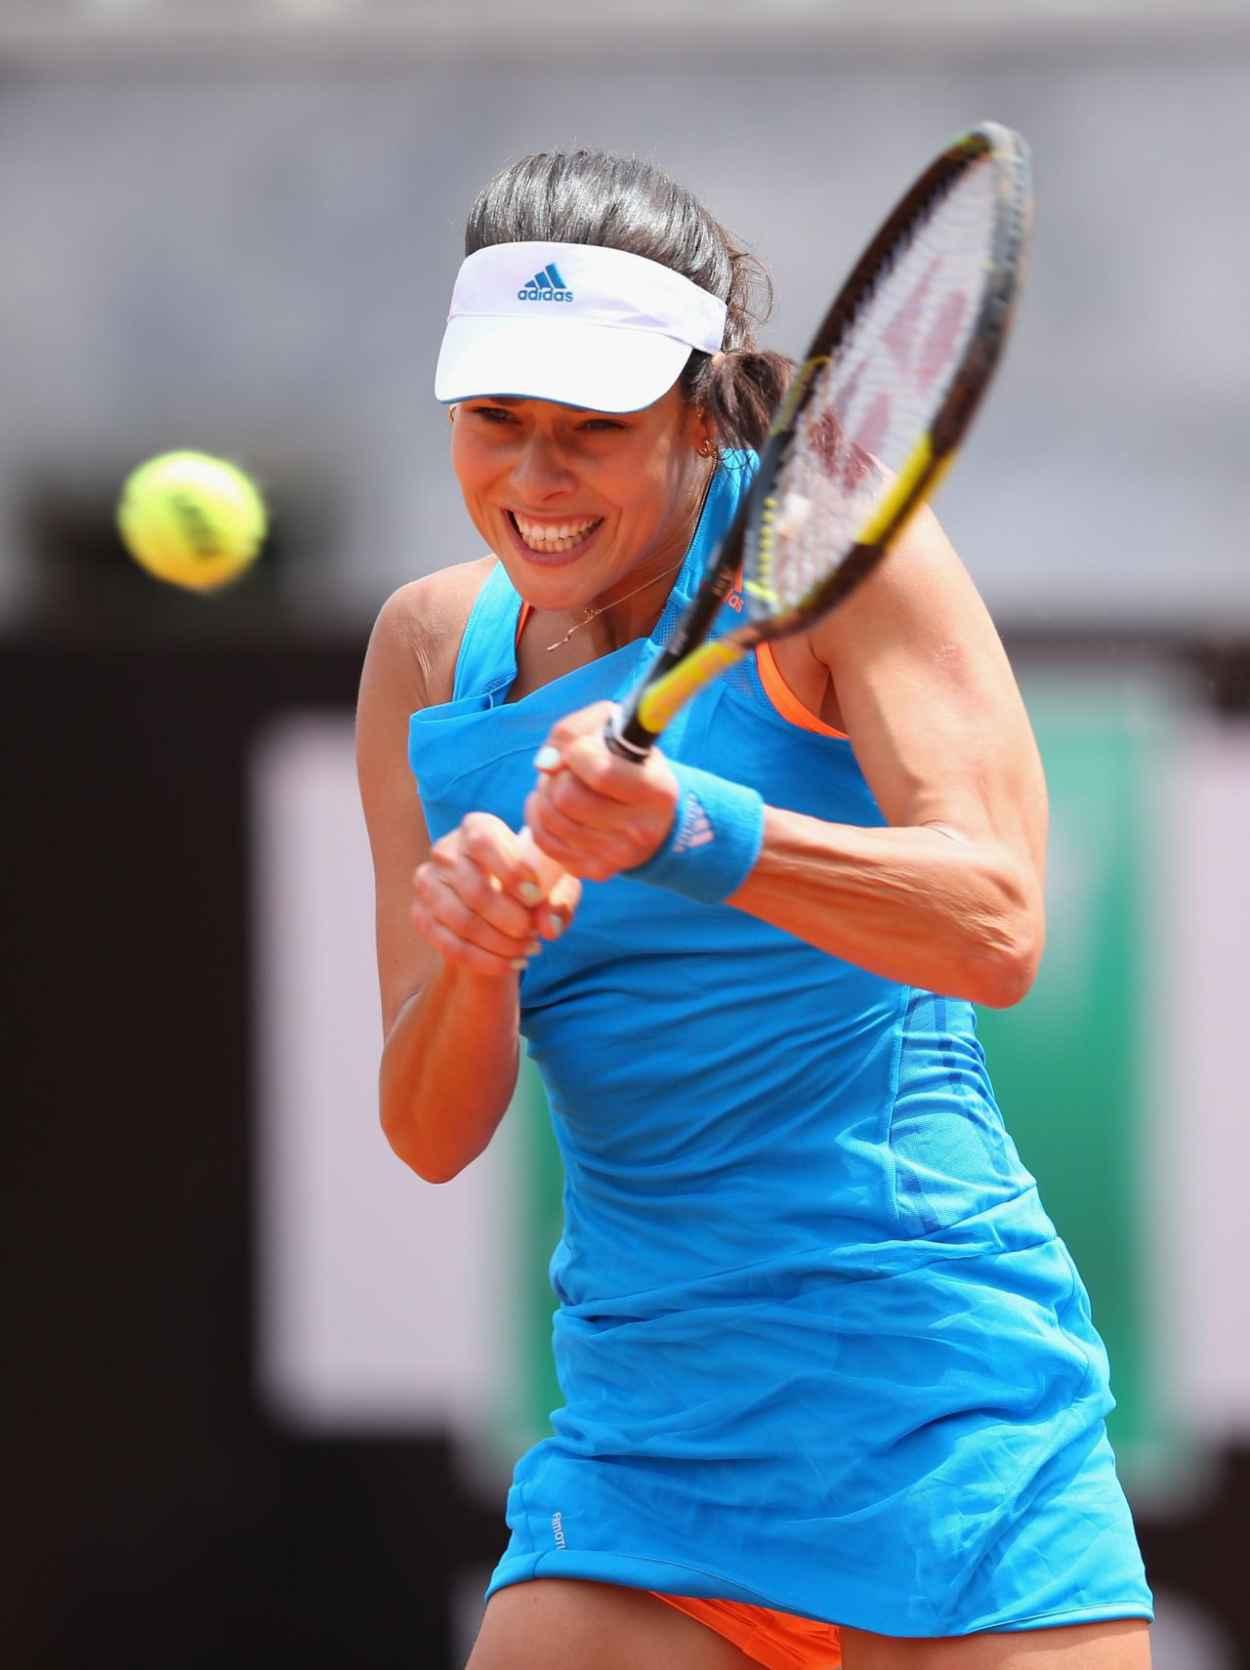 rome open tennis 2014 schedule - photo#24